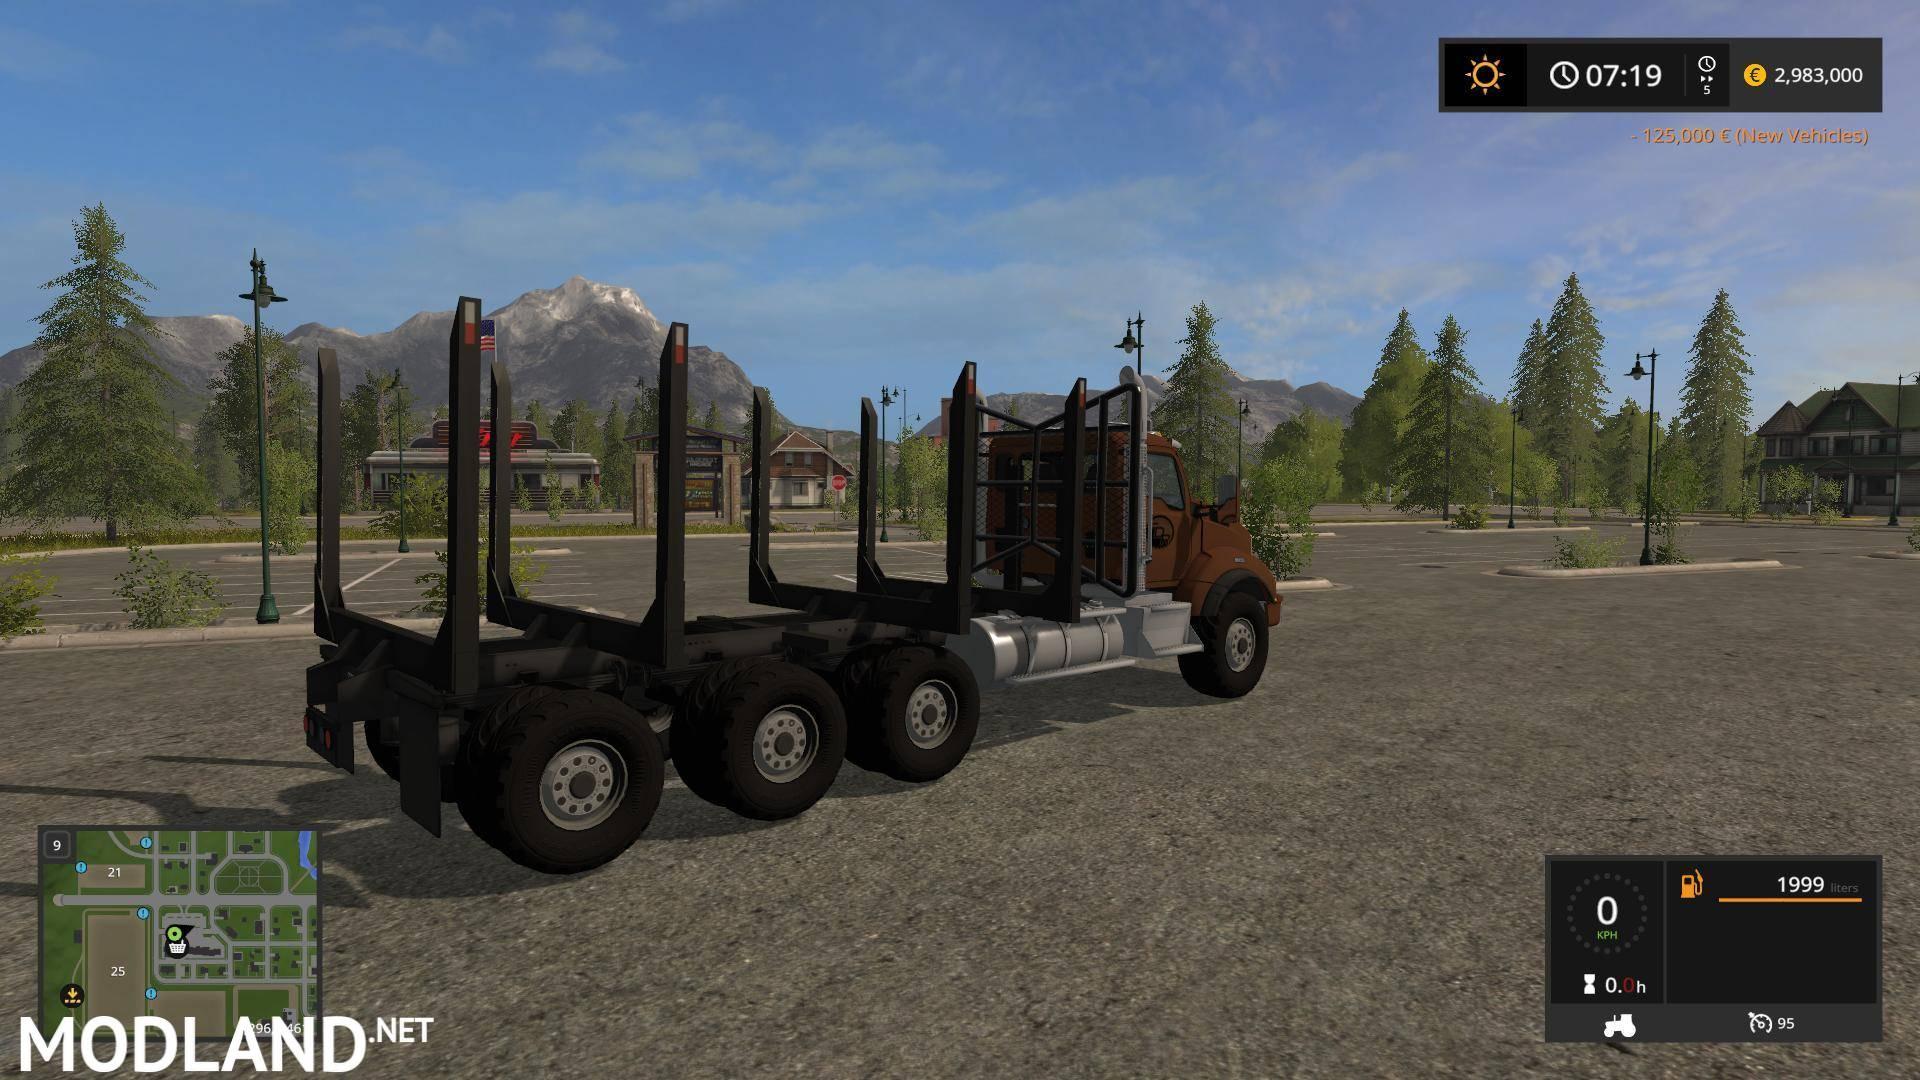 Logging Truck Fixed Bunk v 1.0 mod Farming Simulator 17